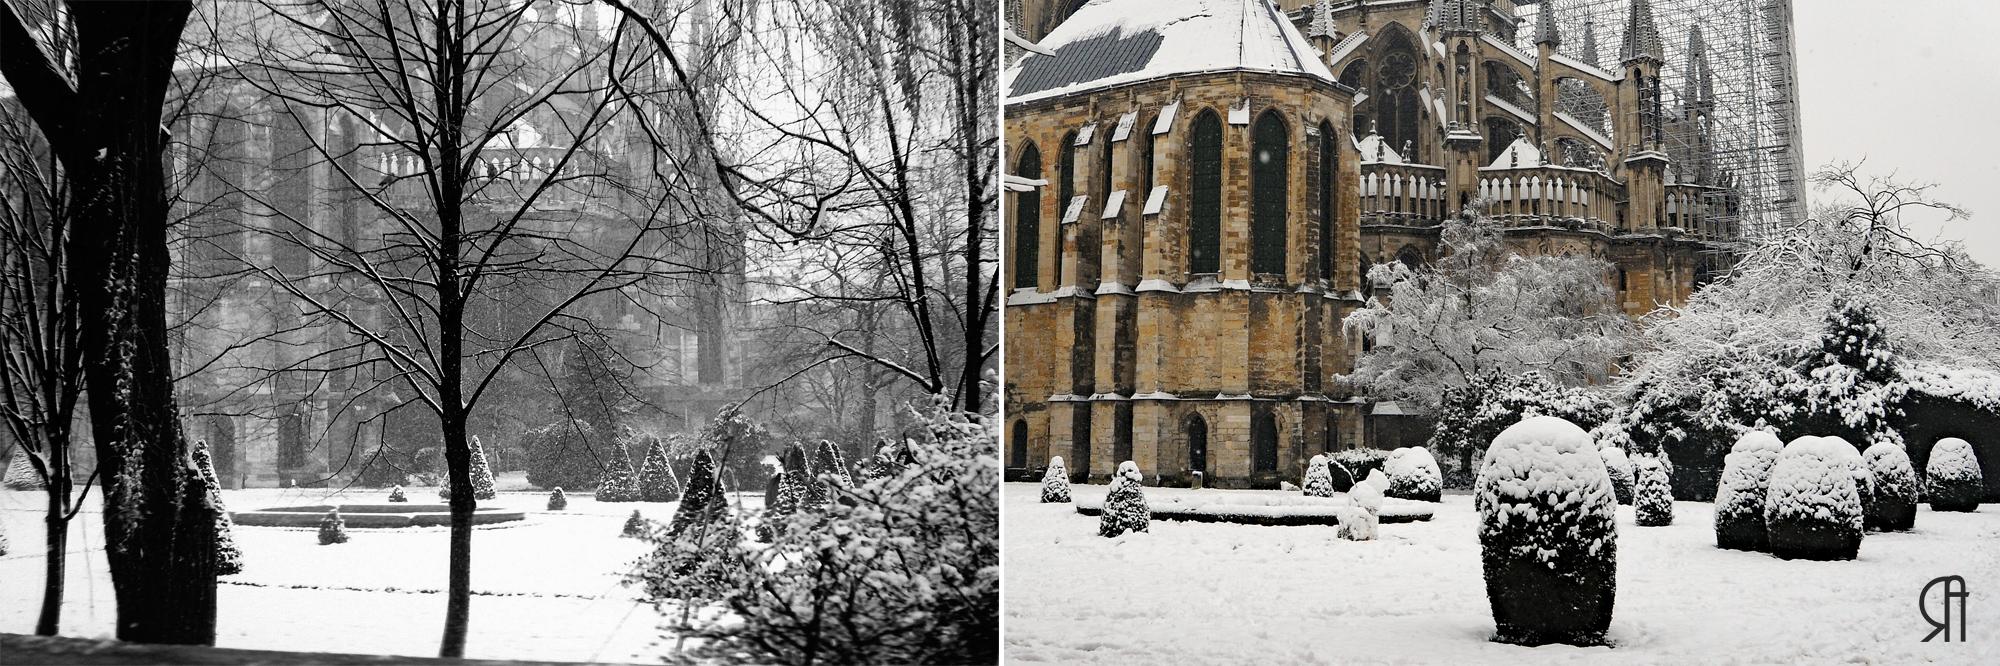 L'abside de la Cathédrale sous la neige